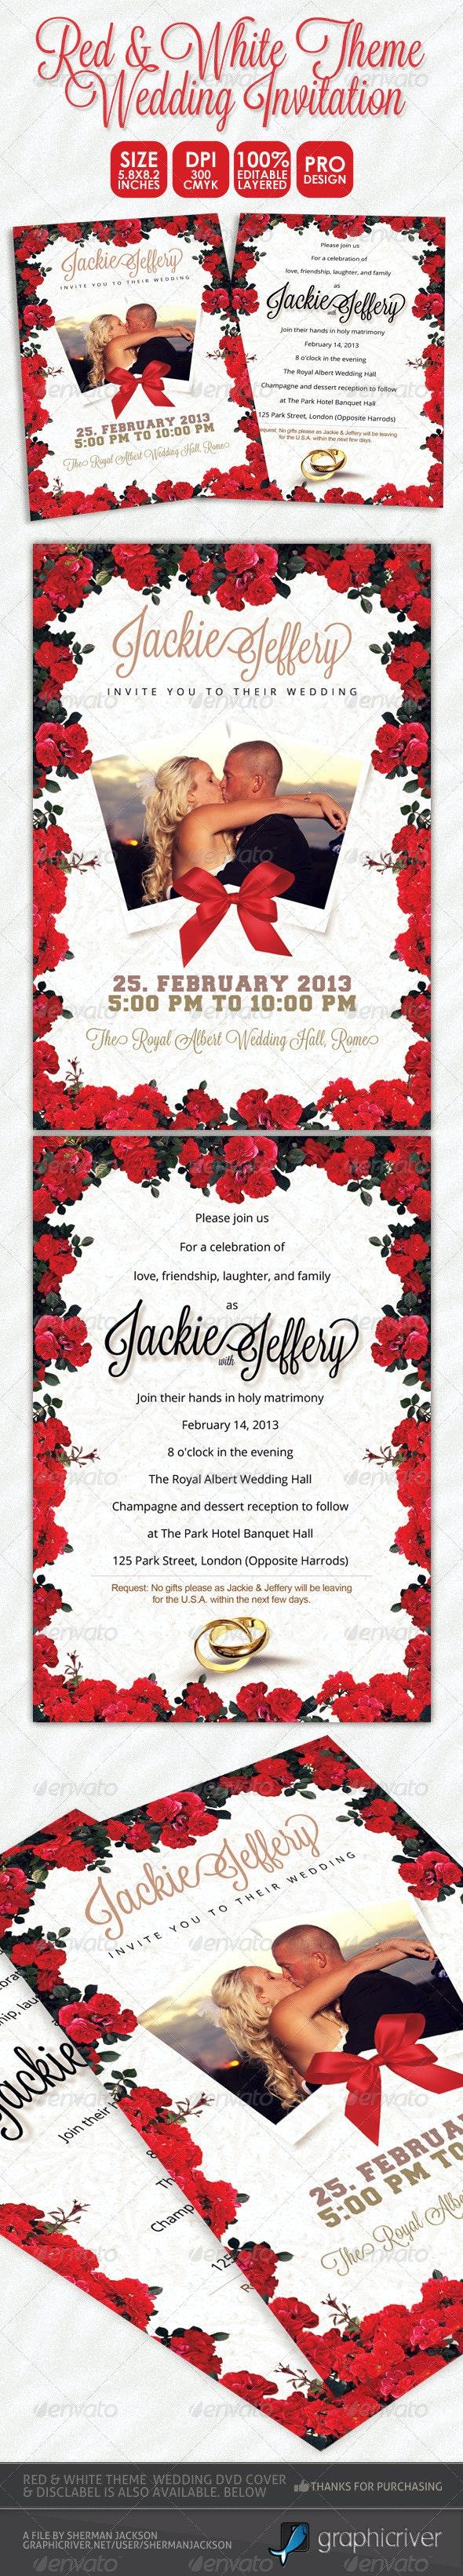 Red & White Theme Wedding Invitation Card - Weddings Cards & Invites